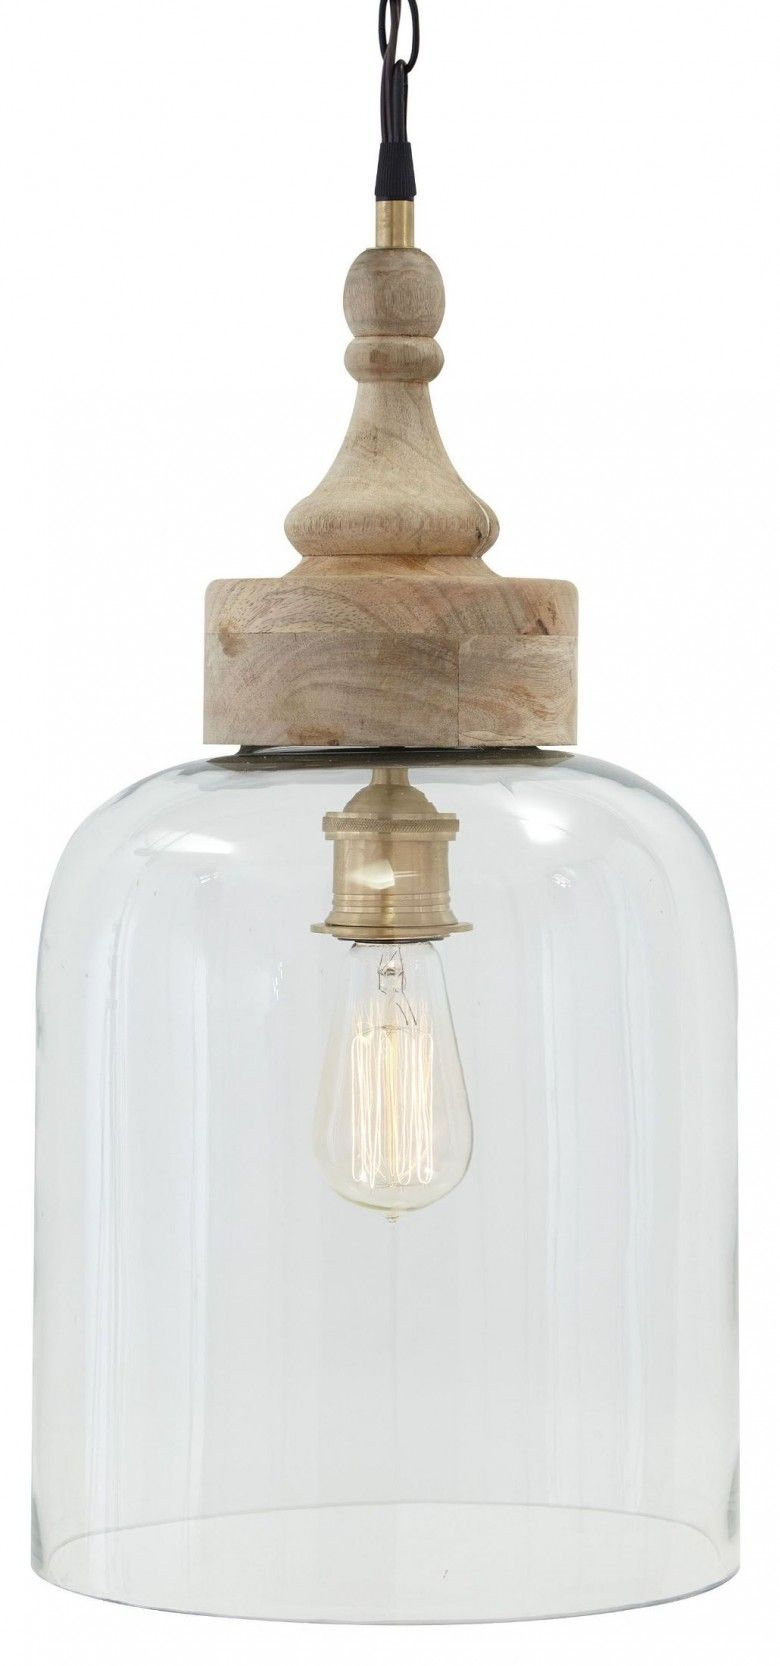 Glass And Natural Wood Pendant Light #pendantlighting